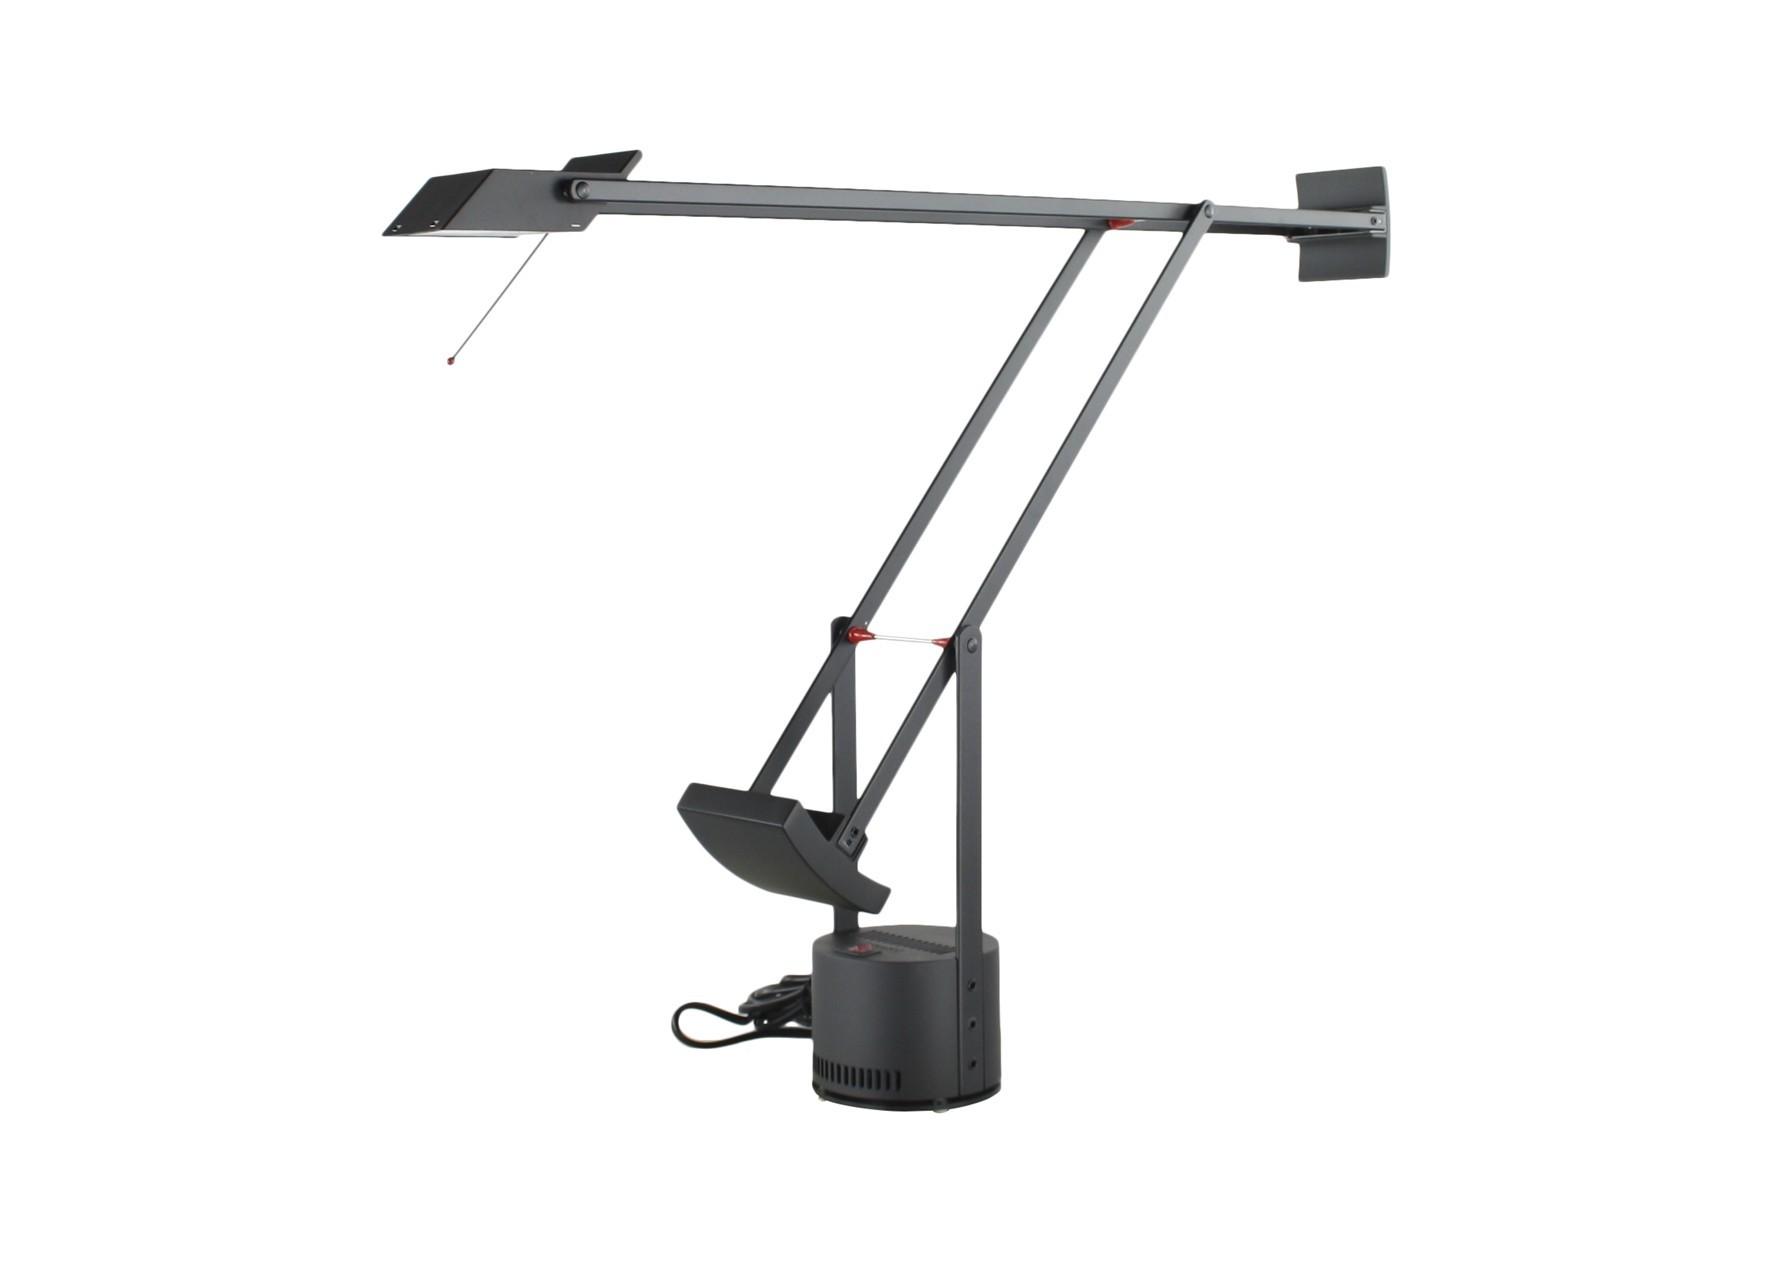 Artemide Tizio Micro Table Lamp Deplain Com